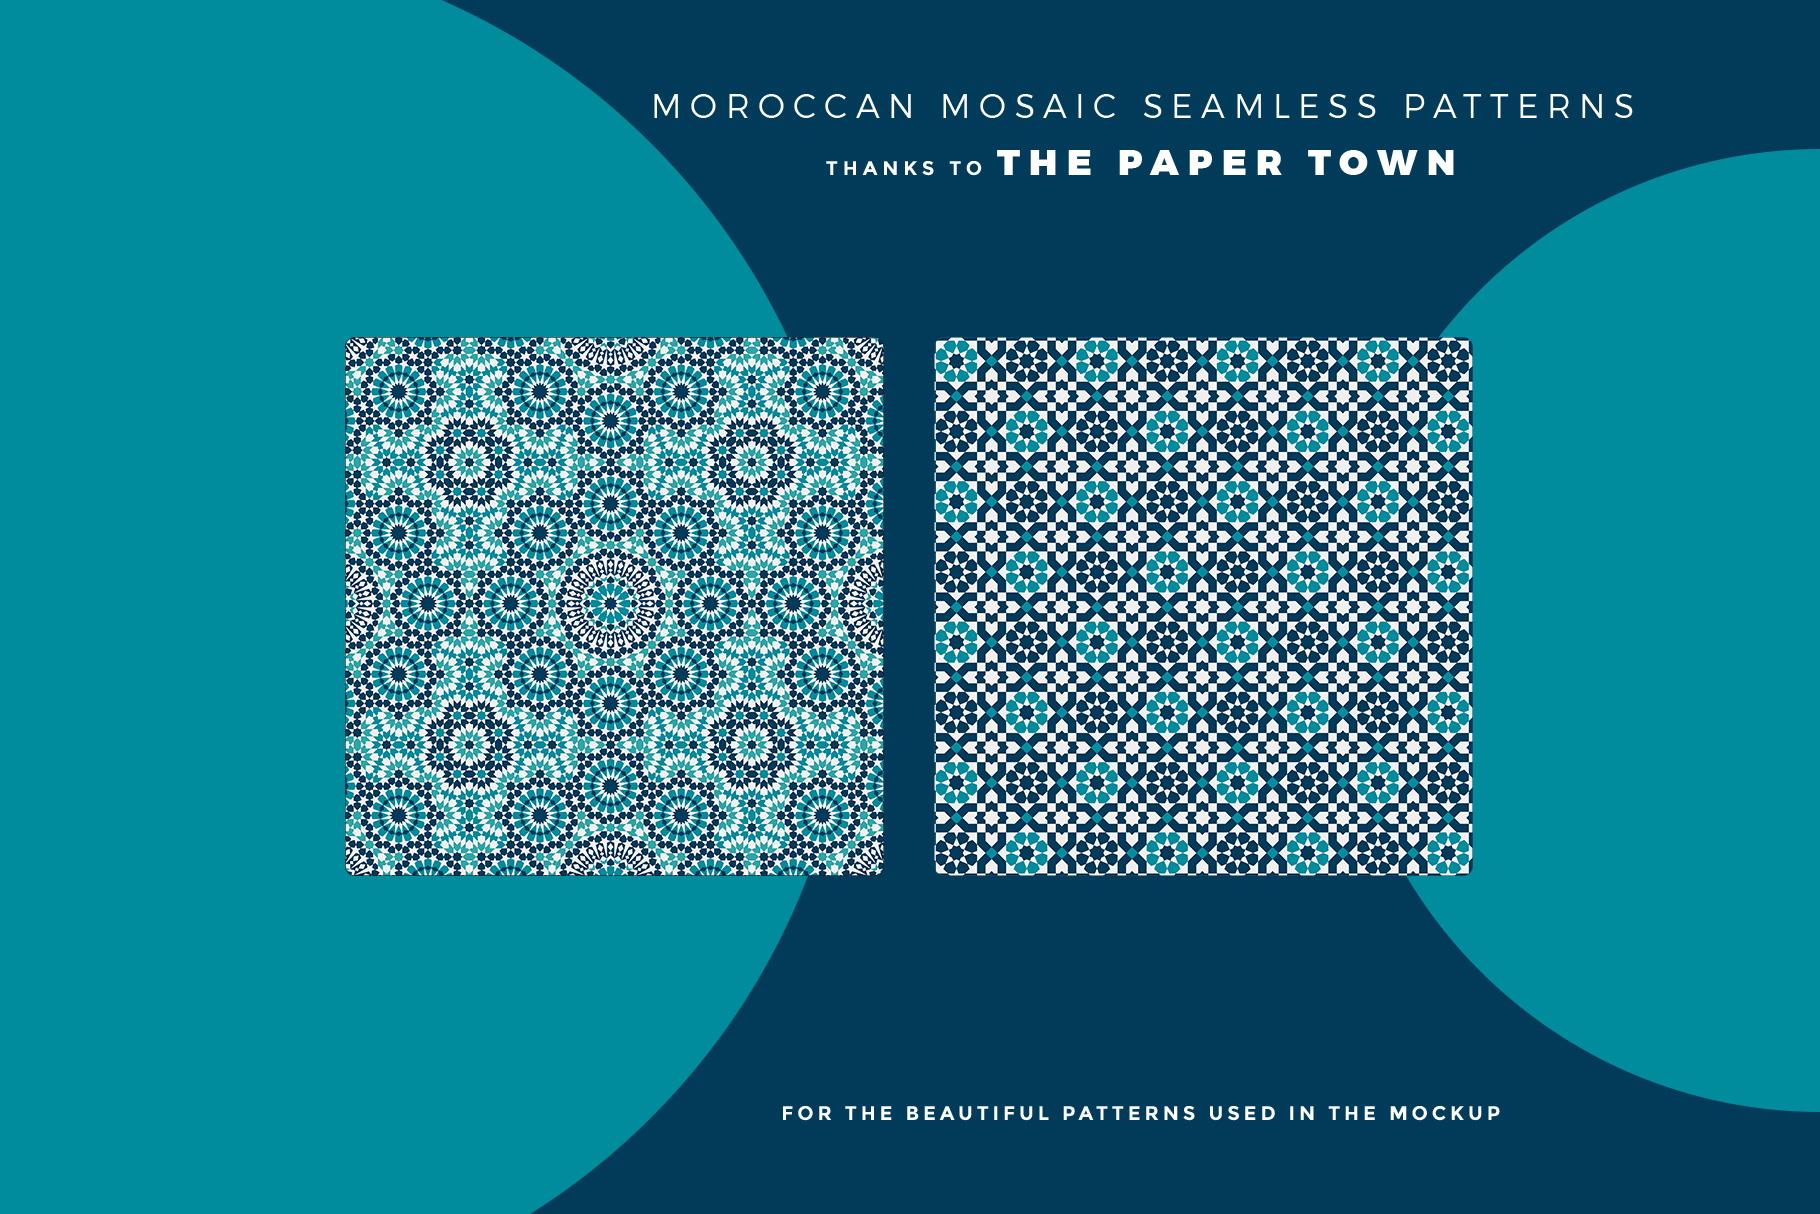 designer's credit of the leather bind journal cover mockup